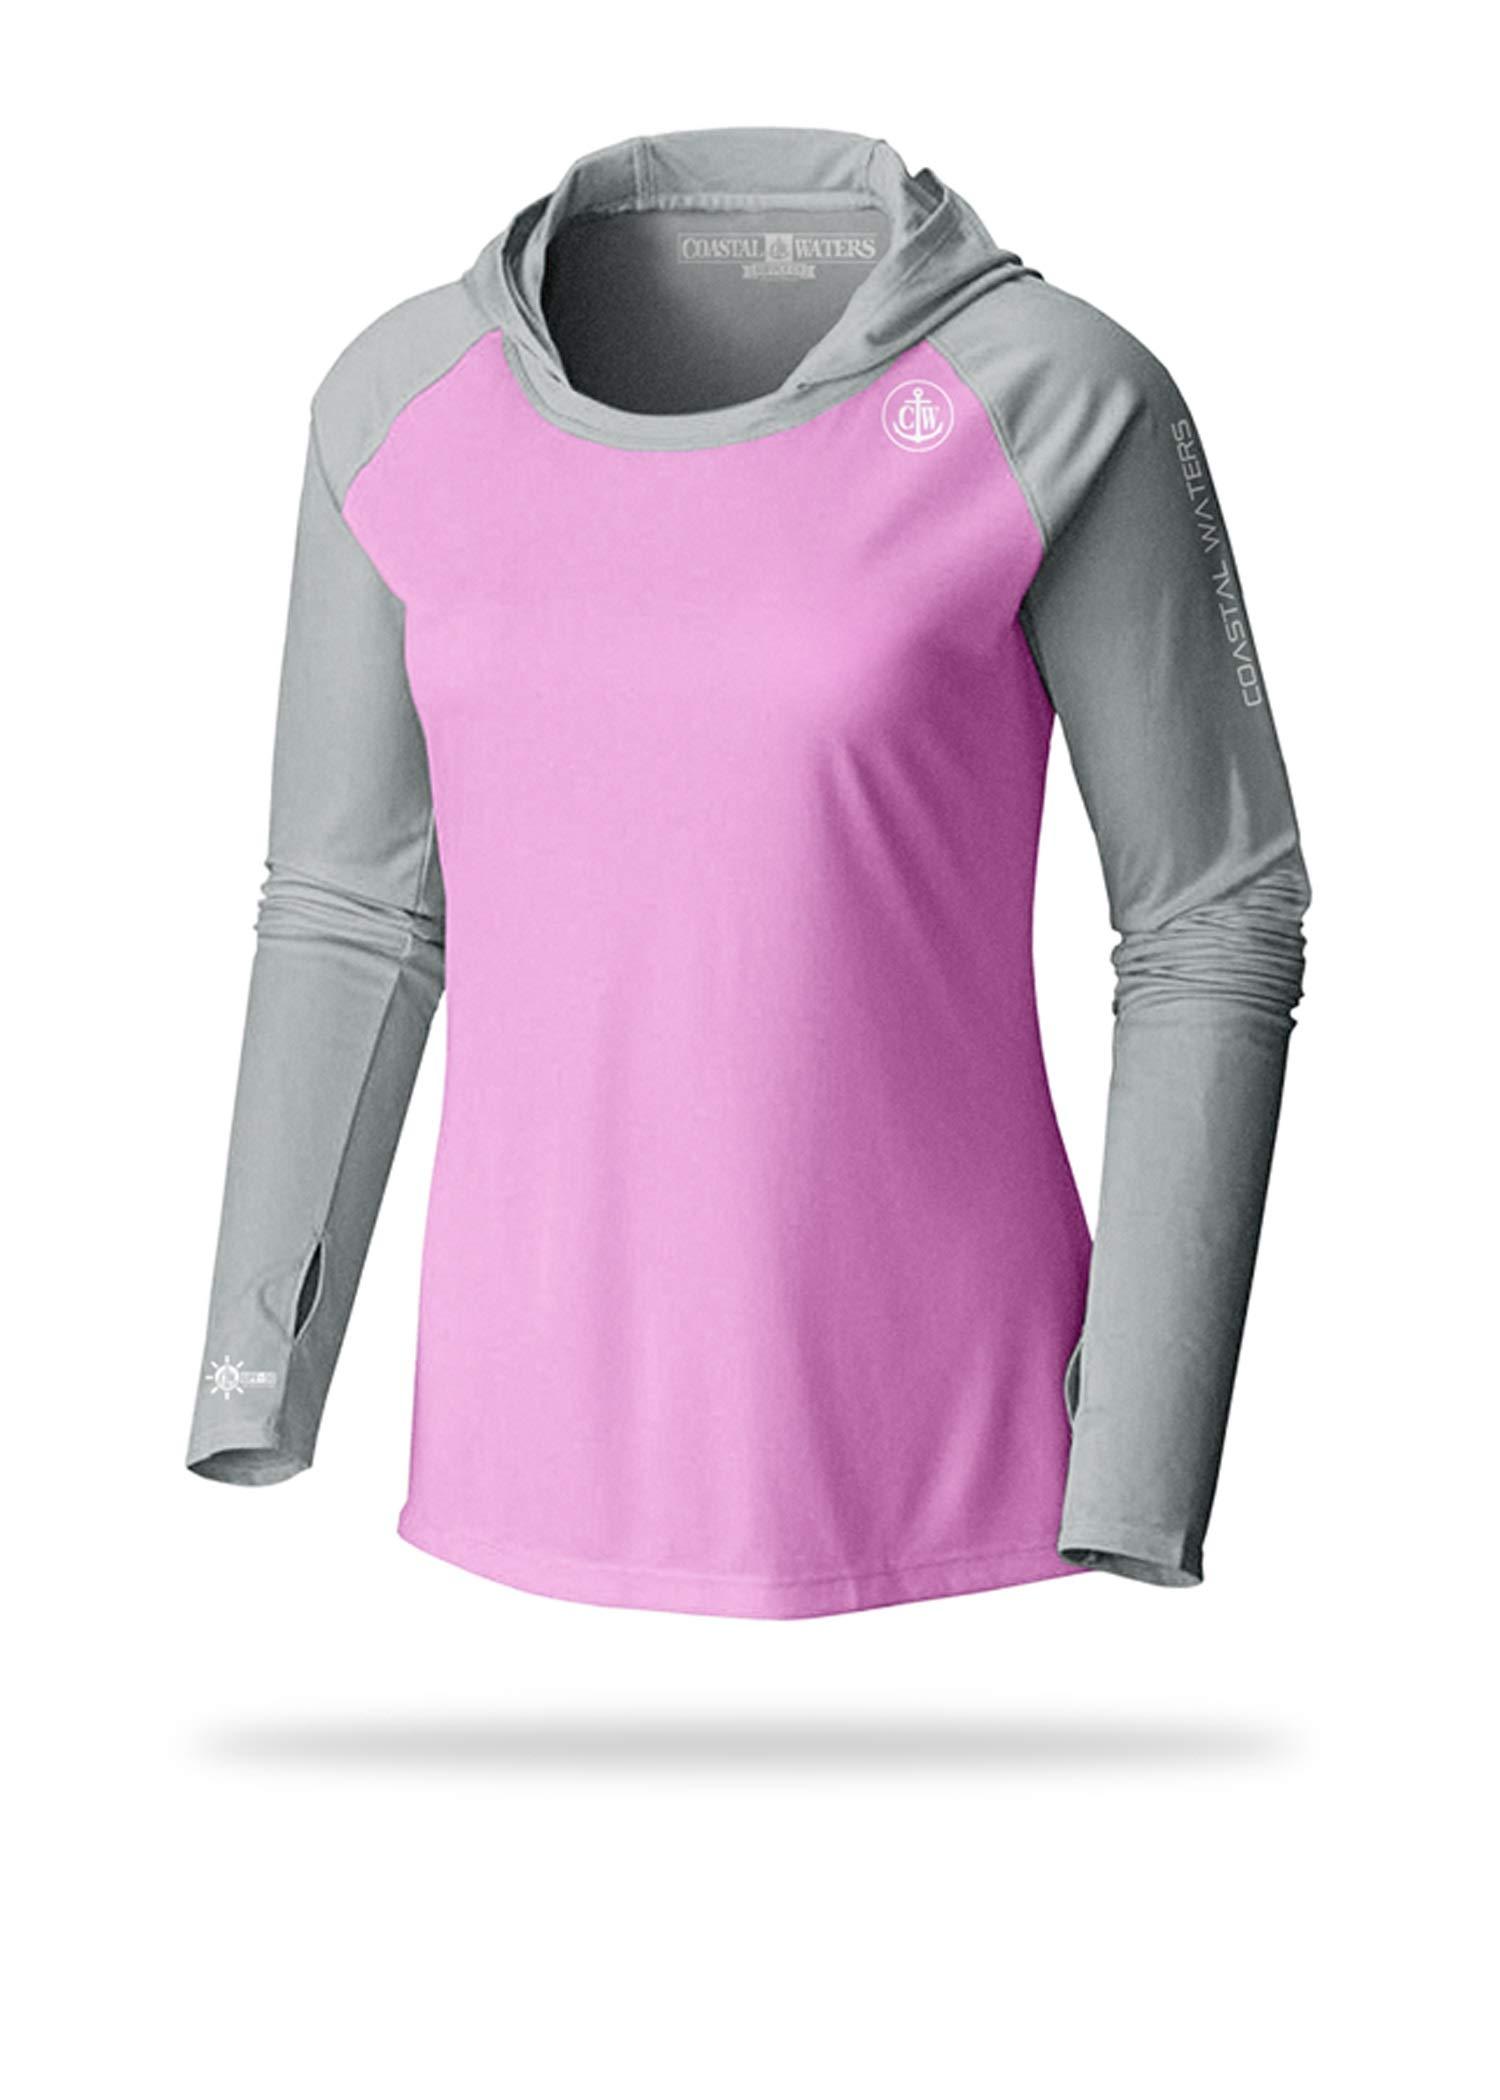 Women's Hooded Raglan Sun Protection (Pink/Grey, Large)